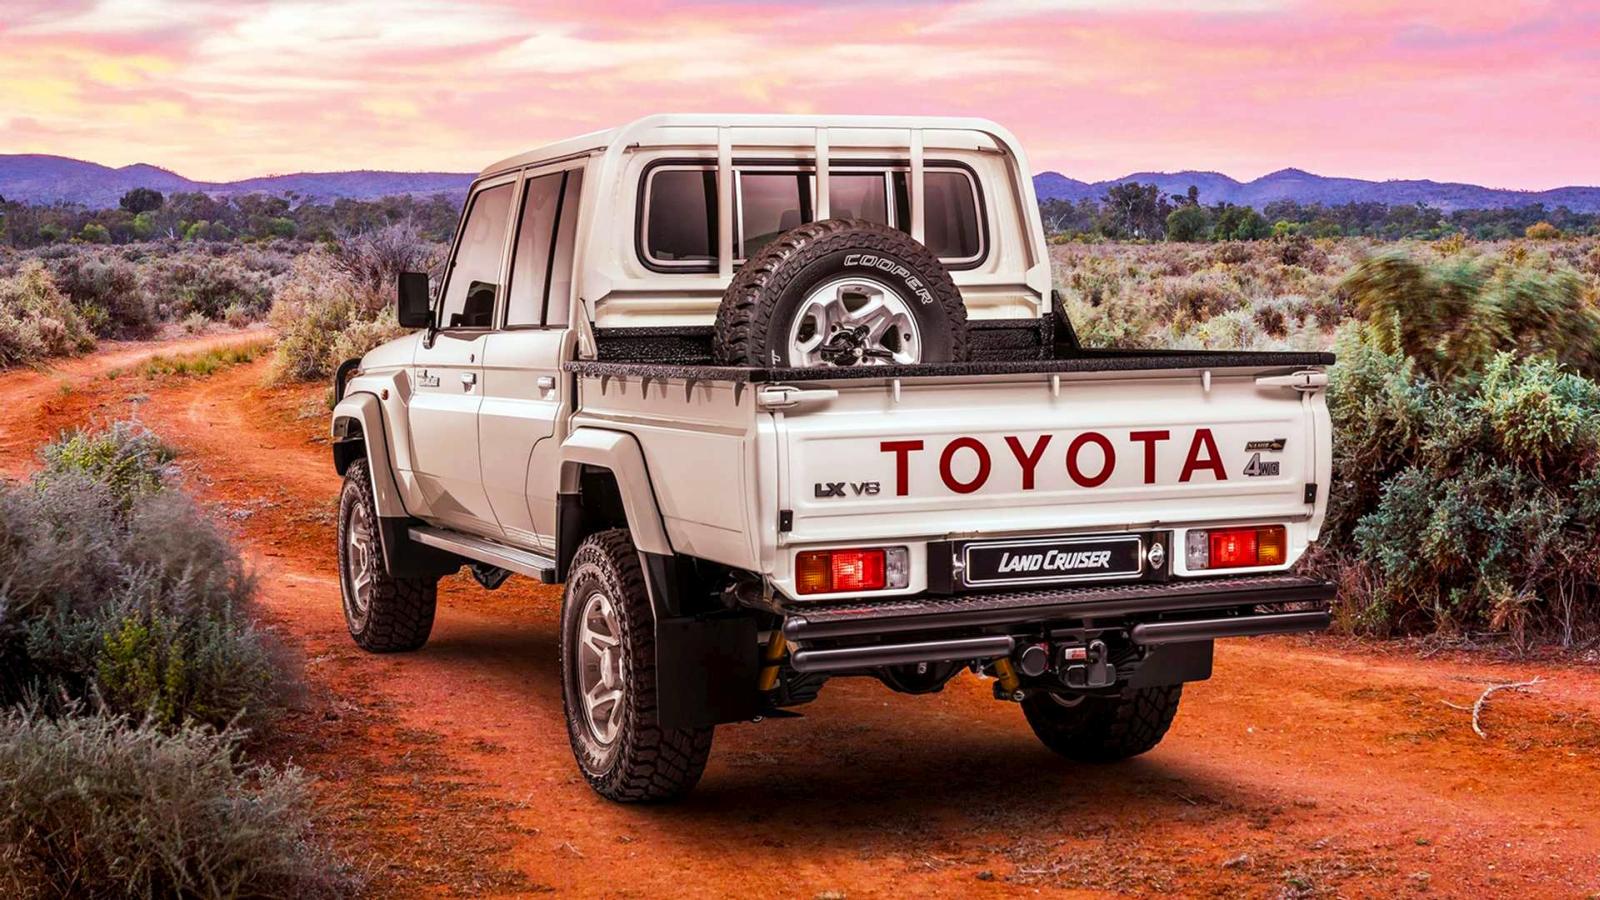 Toyota Land Cruiser 79 Namib Edition